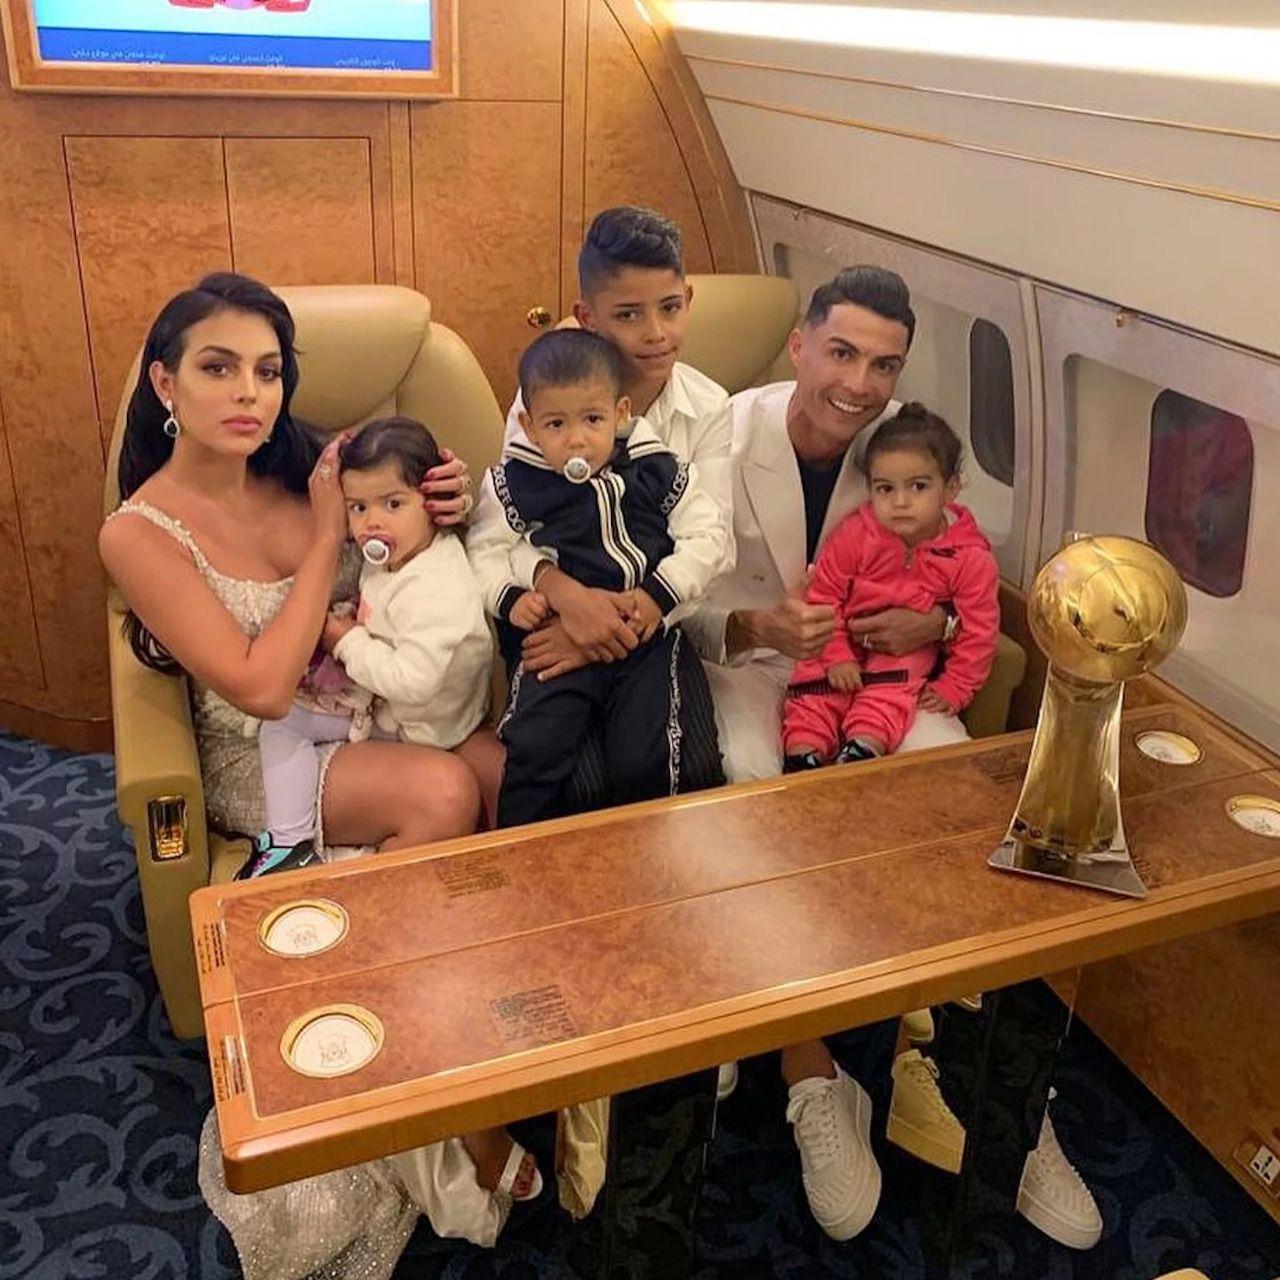 Cristiano Ronaldo Pernah Marah Besar ke Putranya Gara-gara Minum Coca-Cola